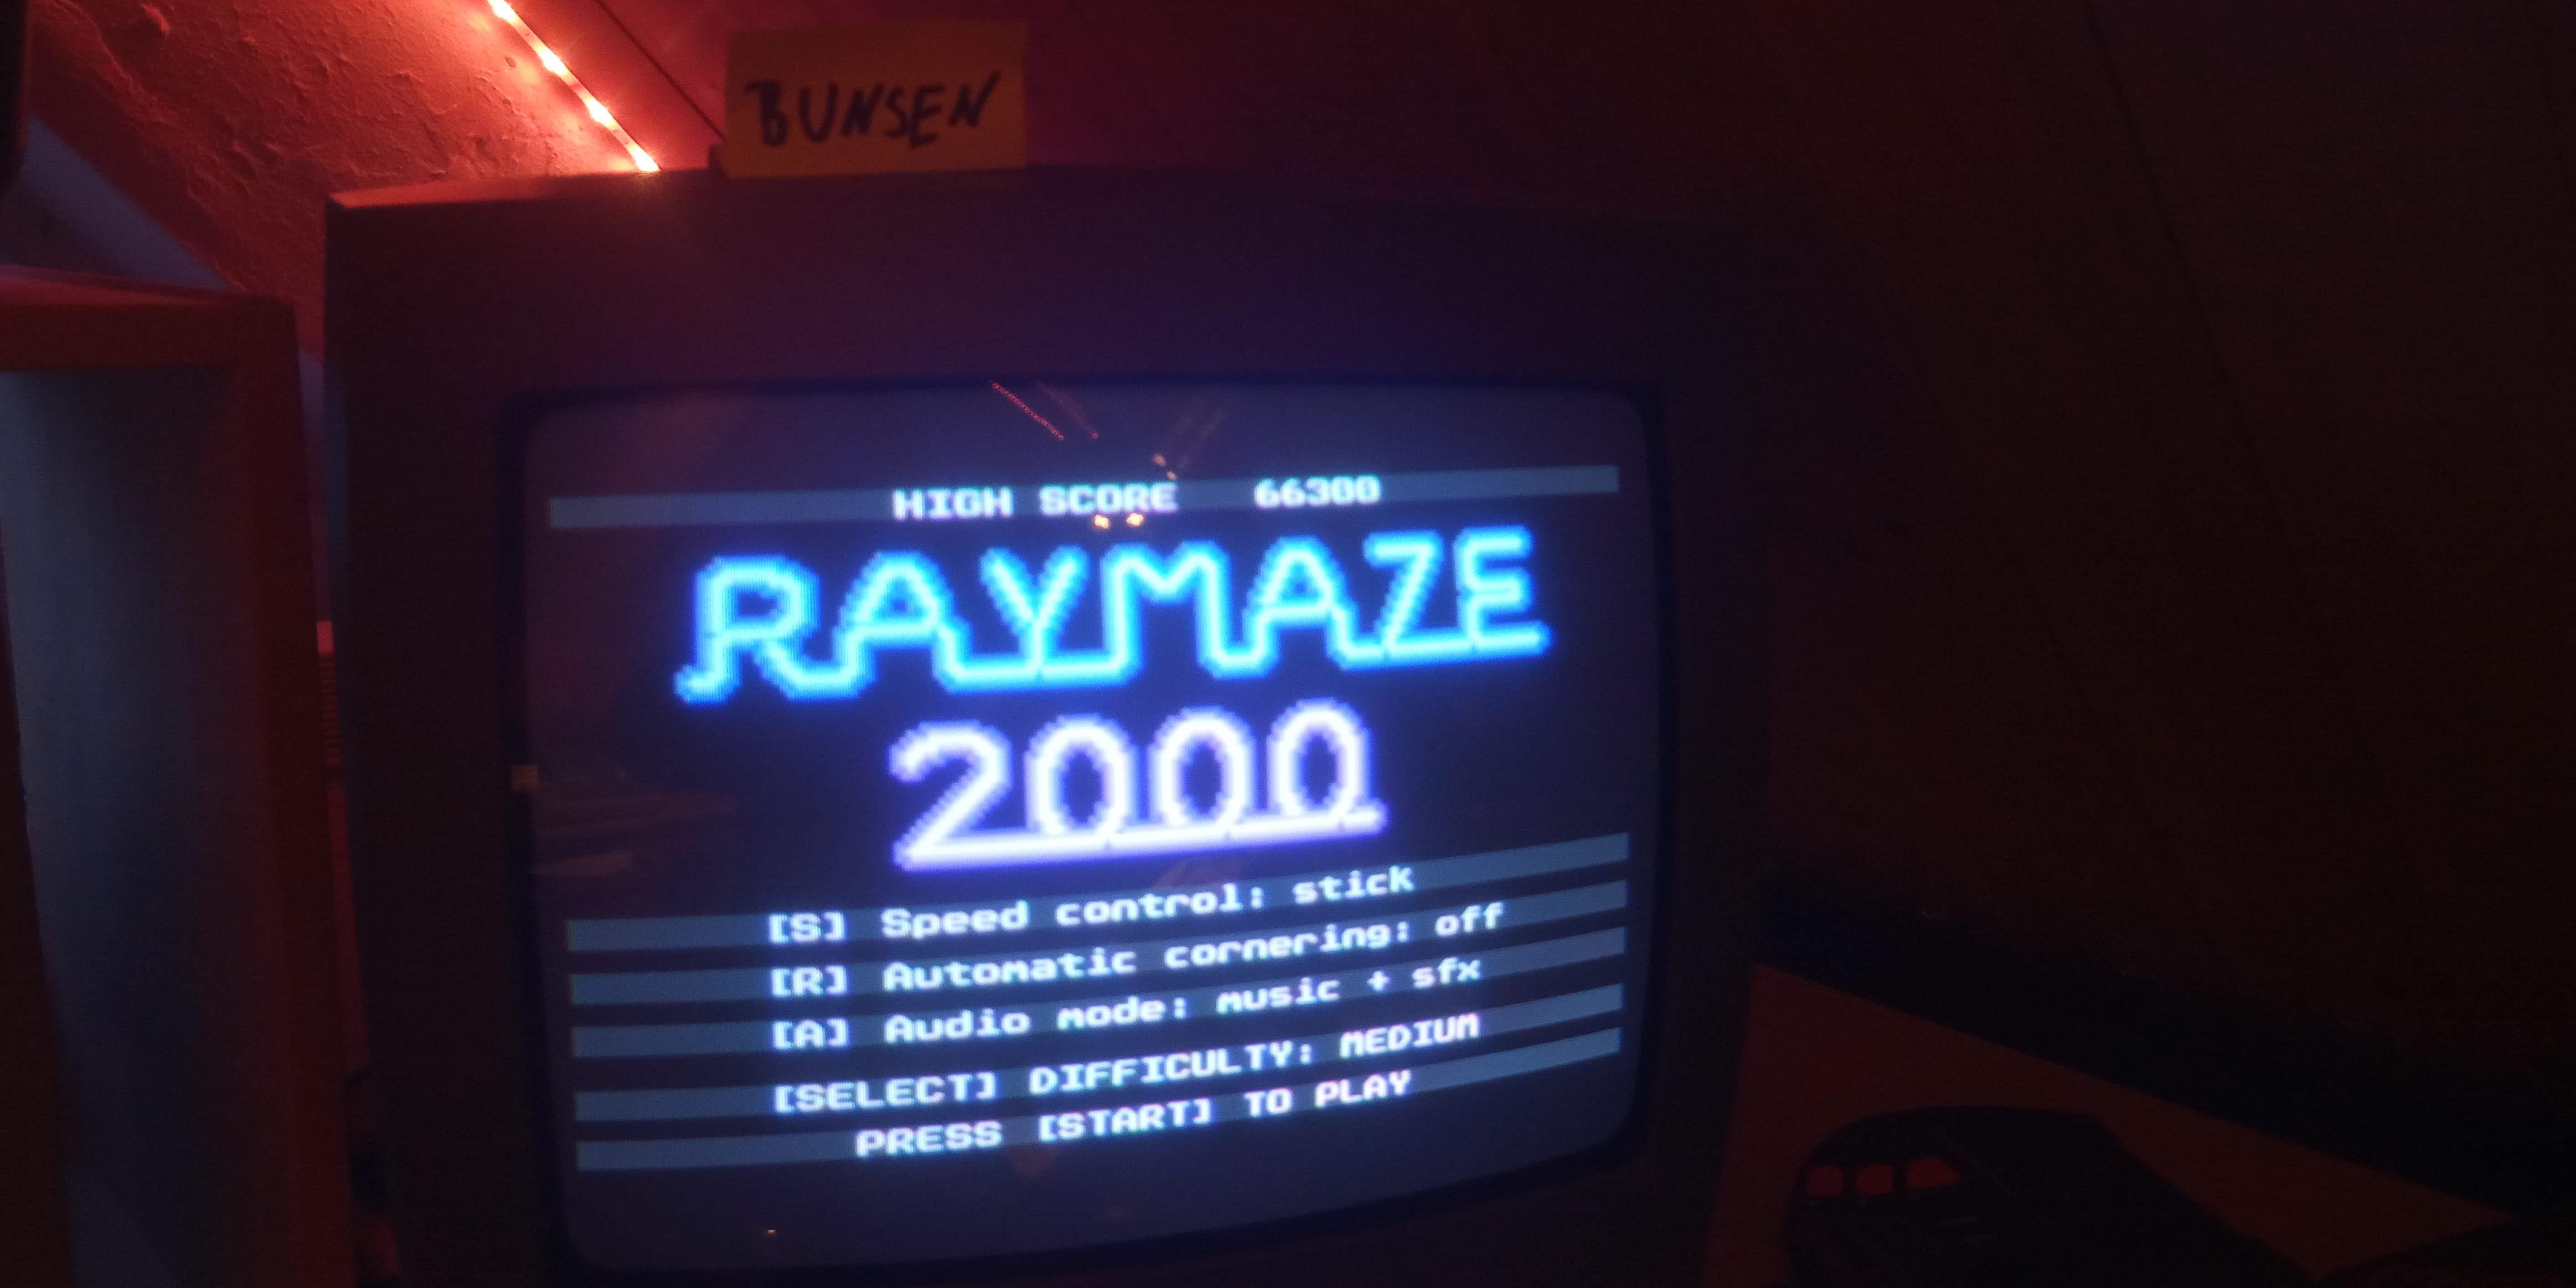 Raymaze 2000 [Difficulty: Medium] 66,300 points